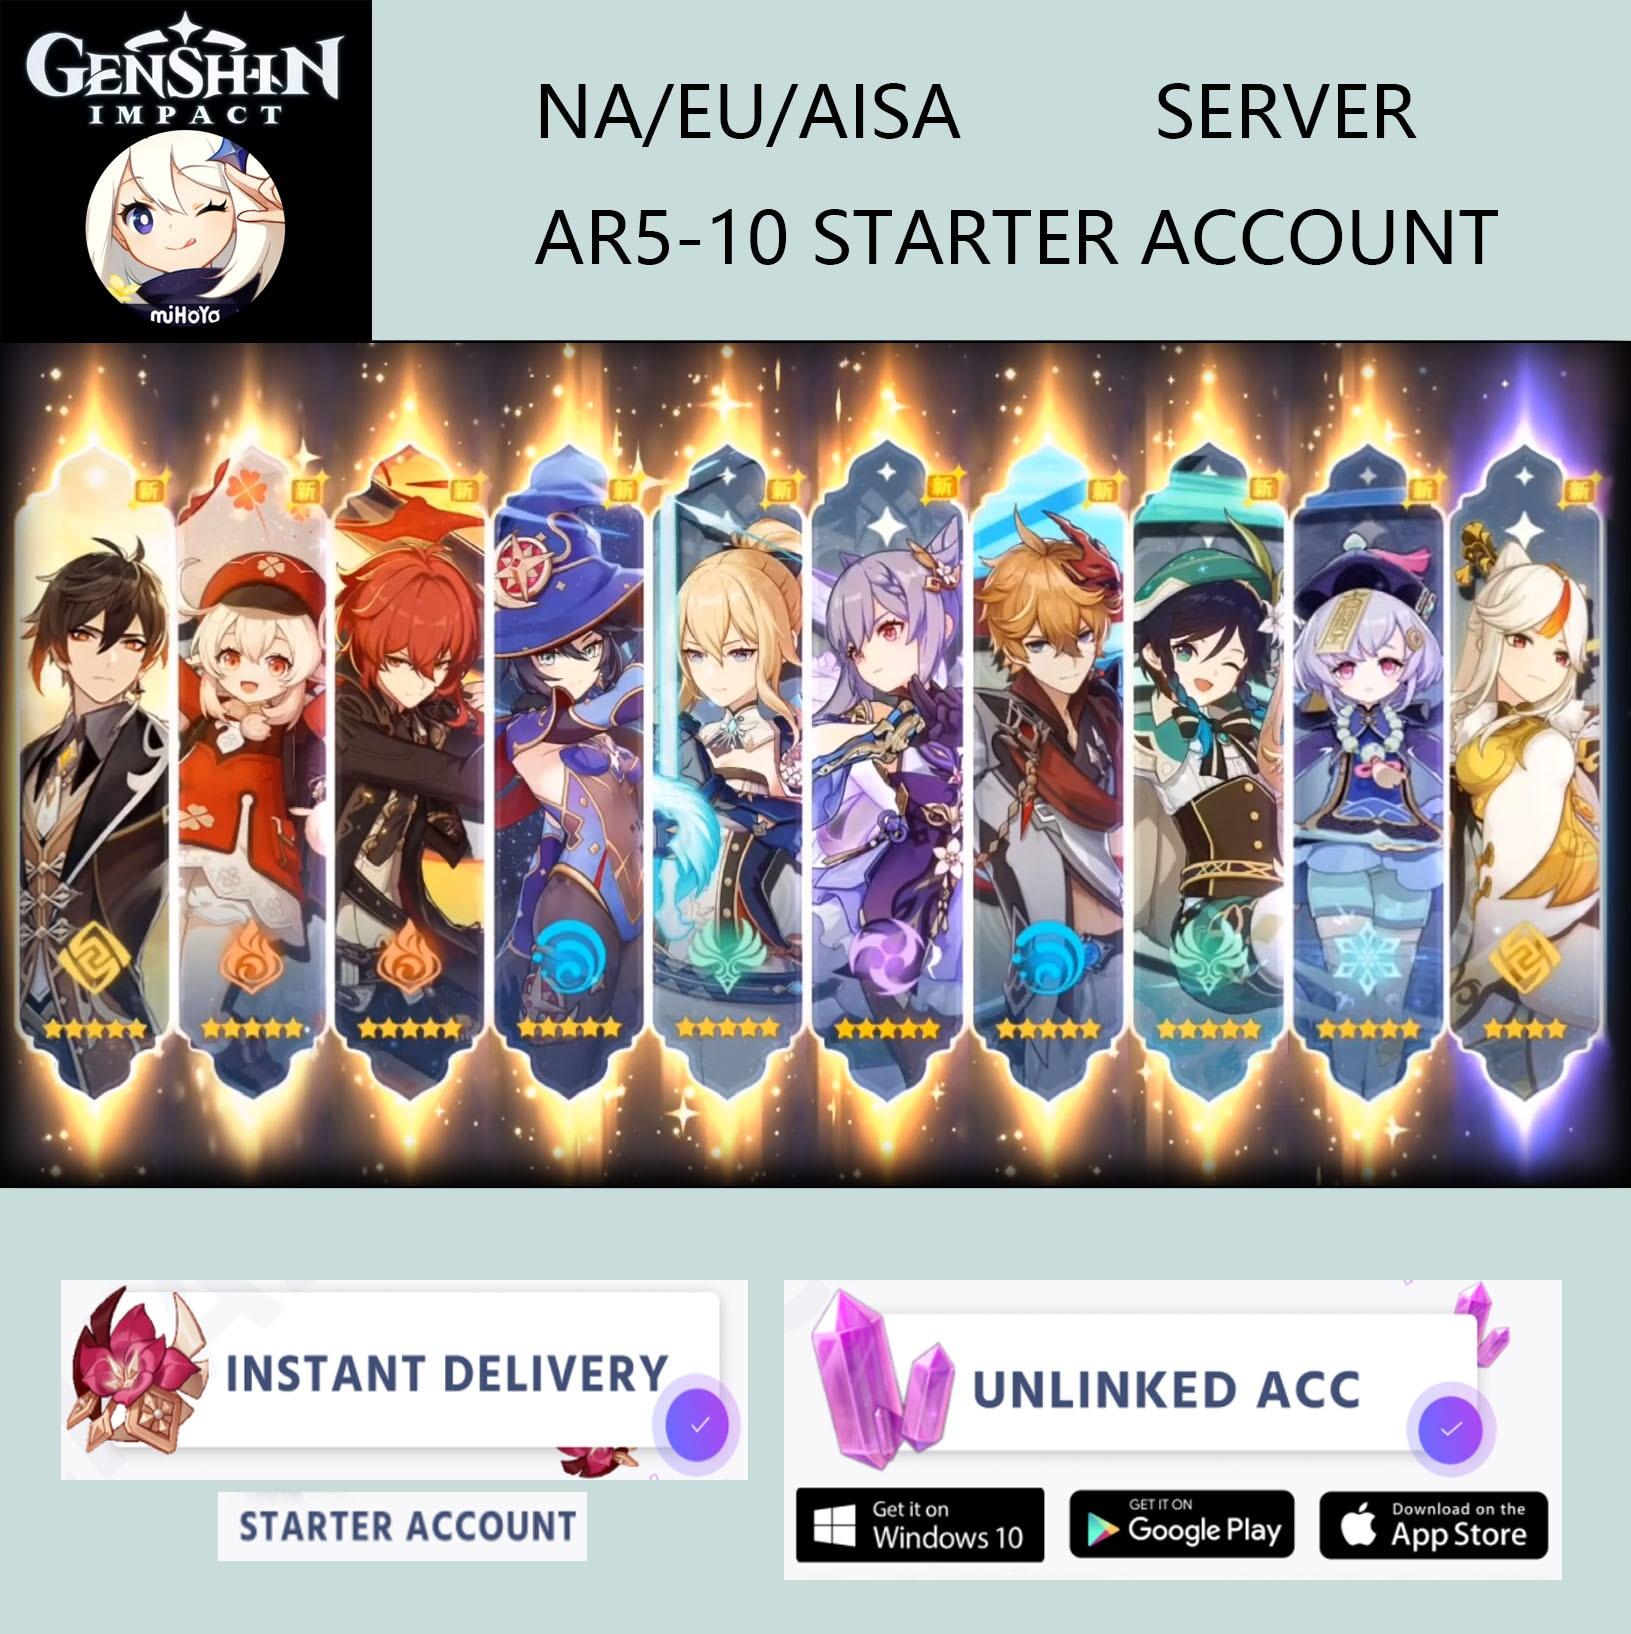 Hutao Genshin Impact Starter Account Venti Klee Tartaglia Childe Zhongli Albedo Ganyu Xiao Diluc AR5-10 Asia/America/Europe